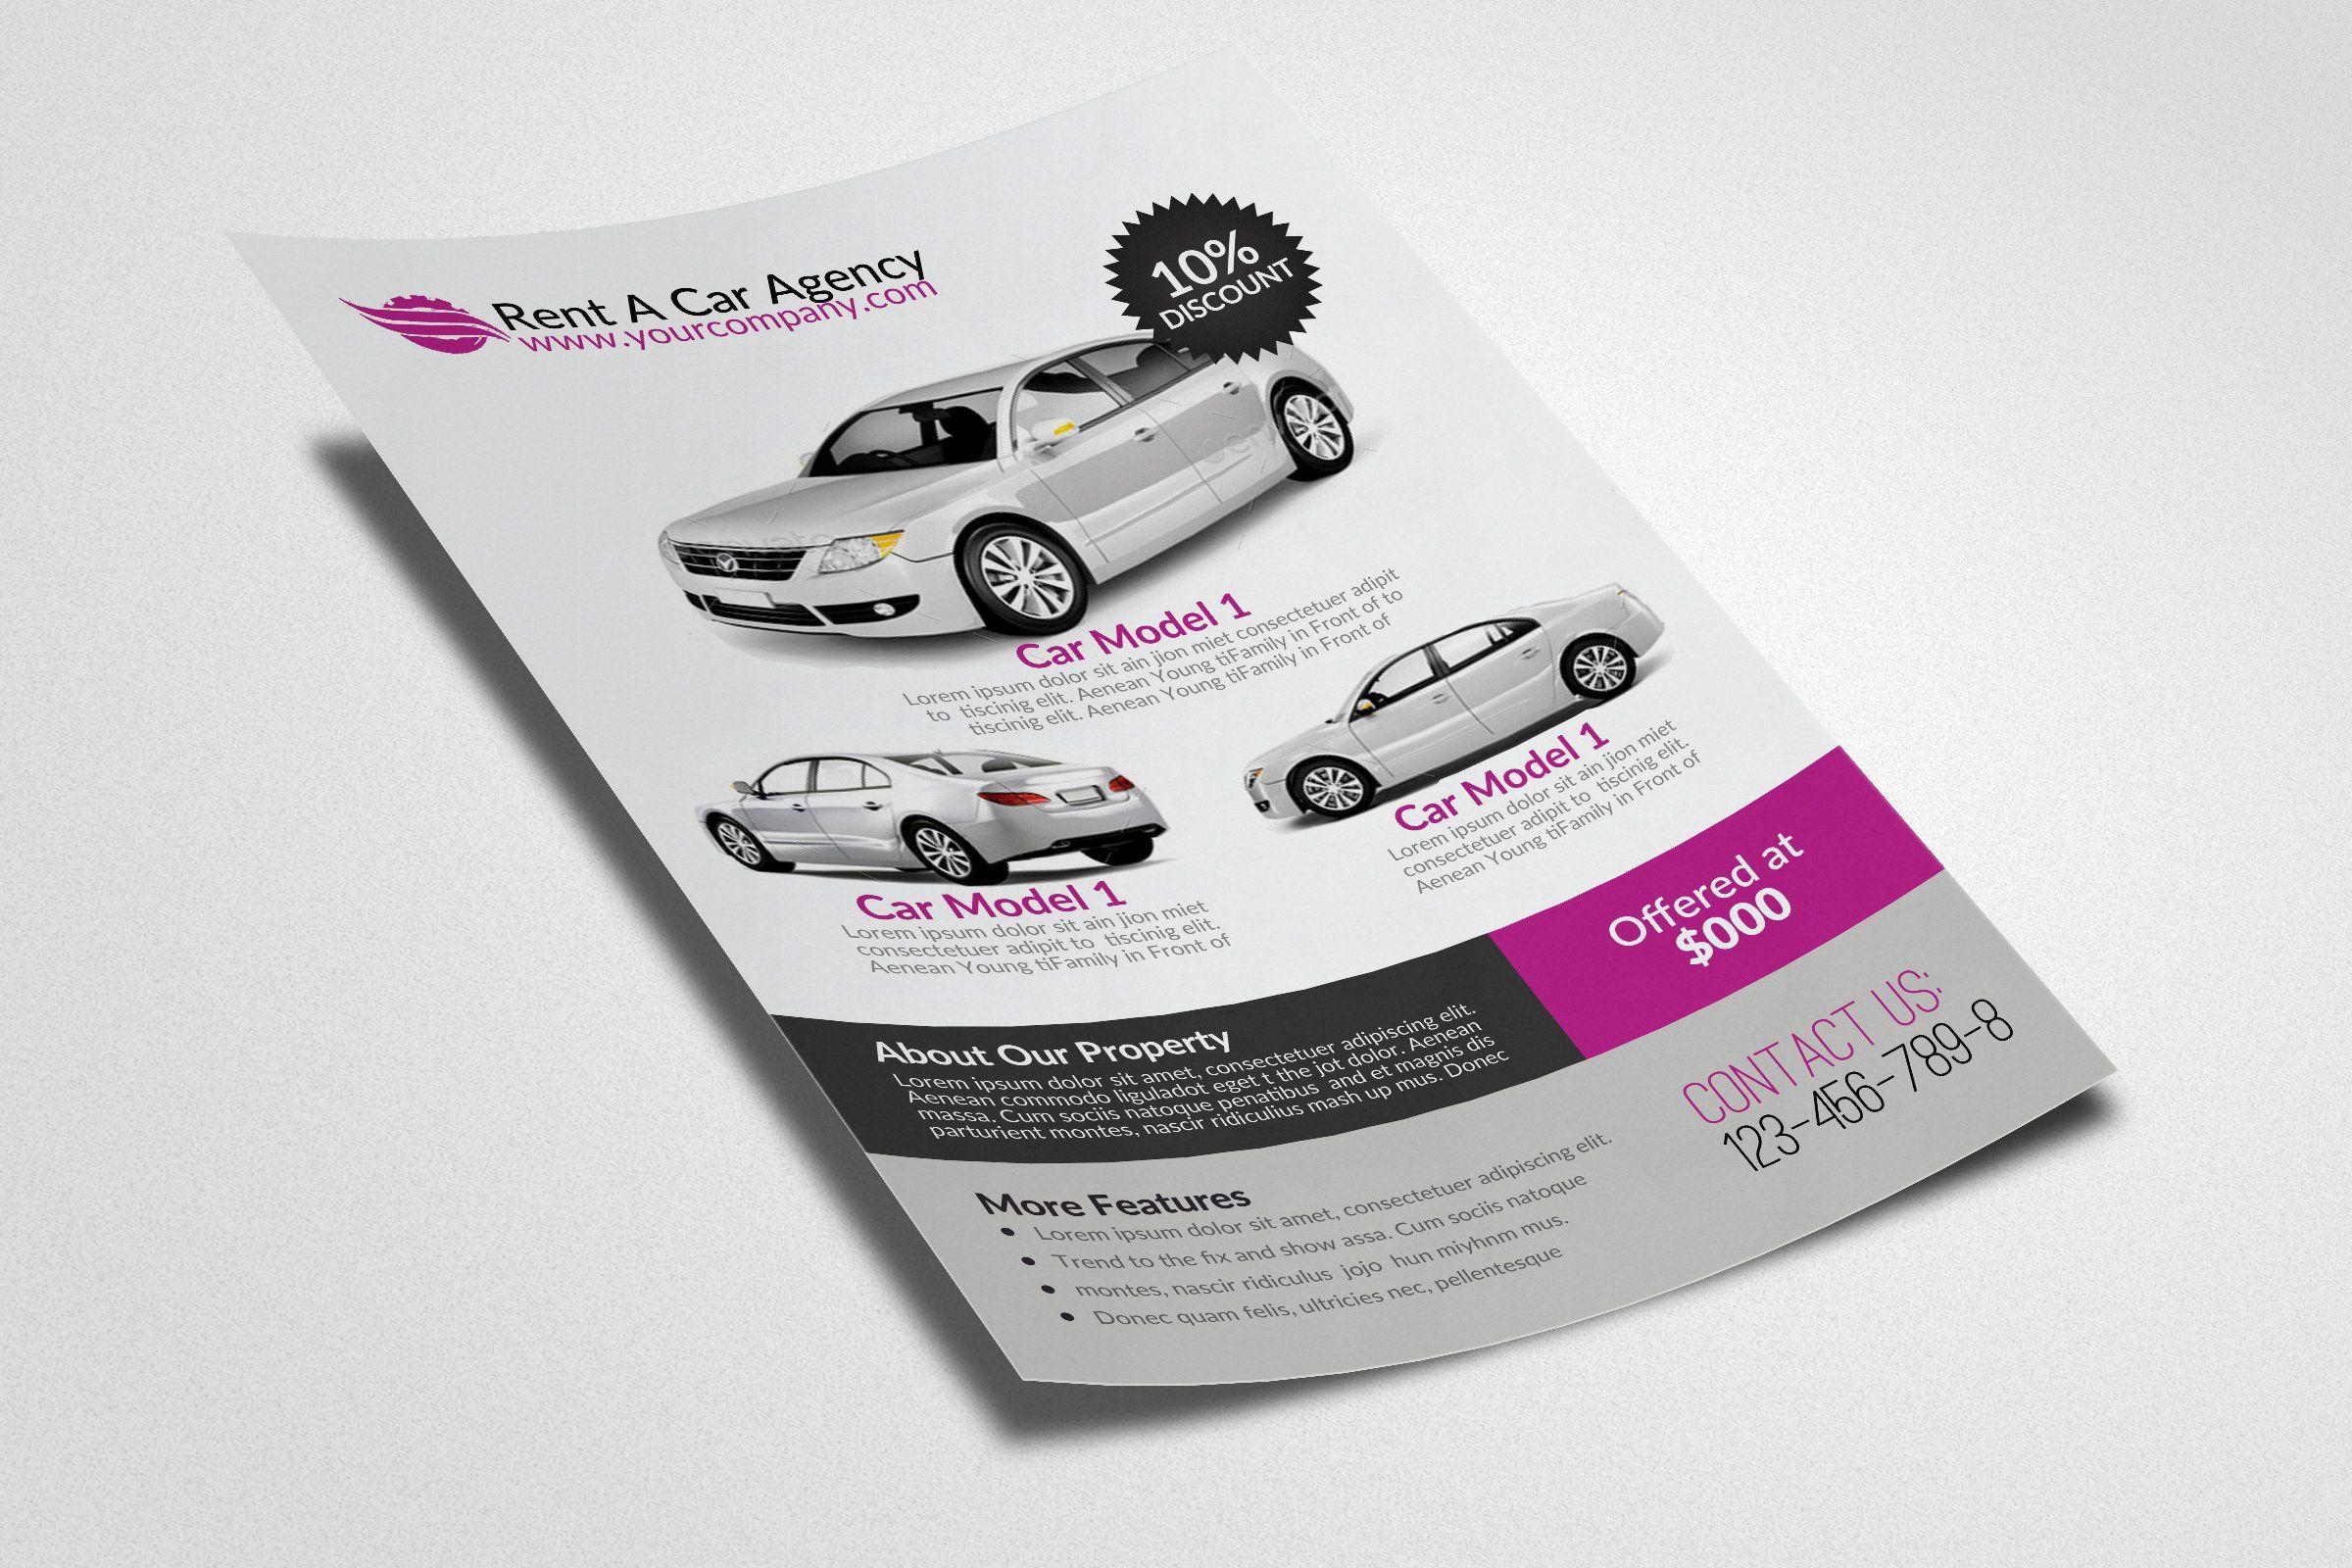 Download Rent A Car Flyer Template Flyer Template Flyer Flyer Design Templates PSD Mockup Templates